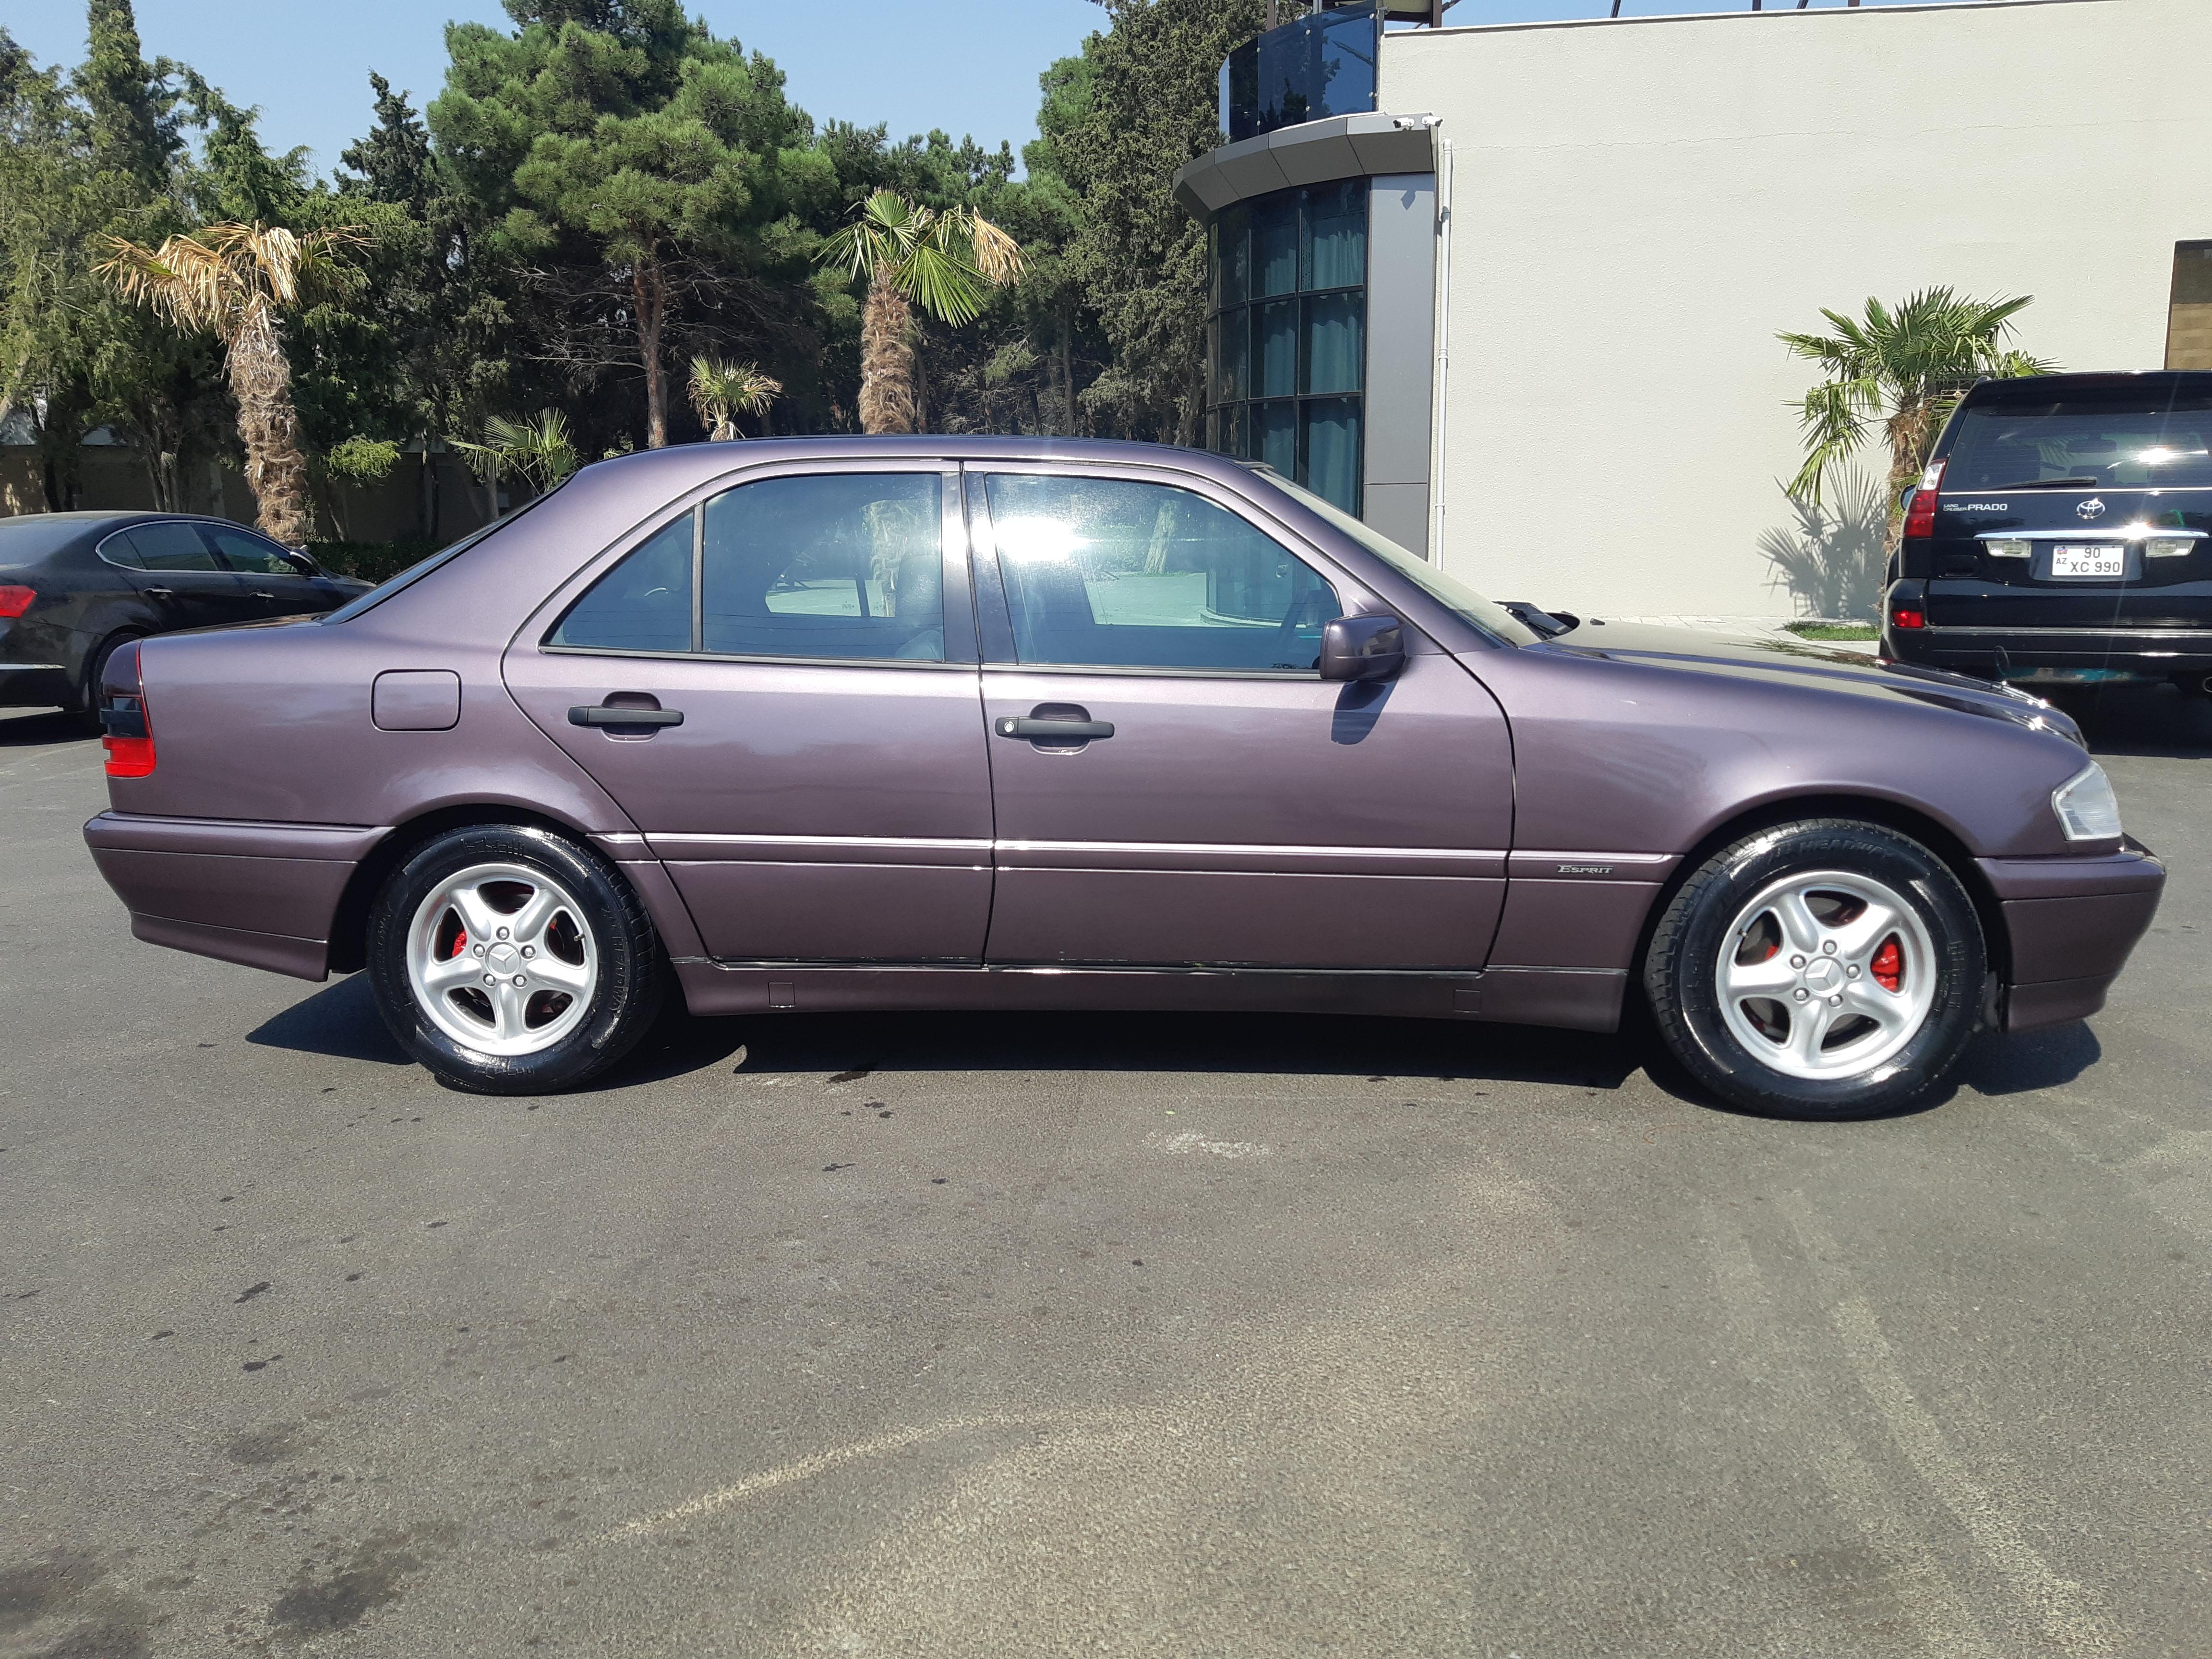 Mercedes-Benz C 180 1.8(lt) 1995 Second hand  $5400